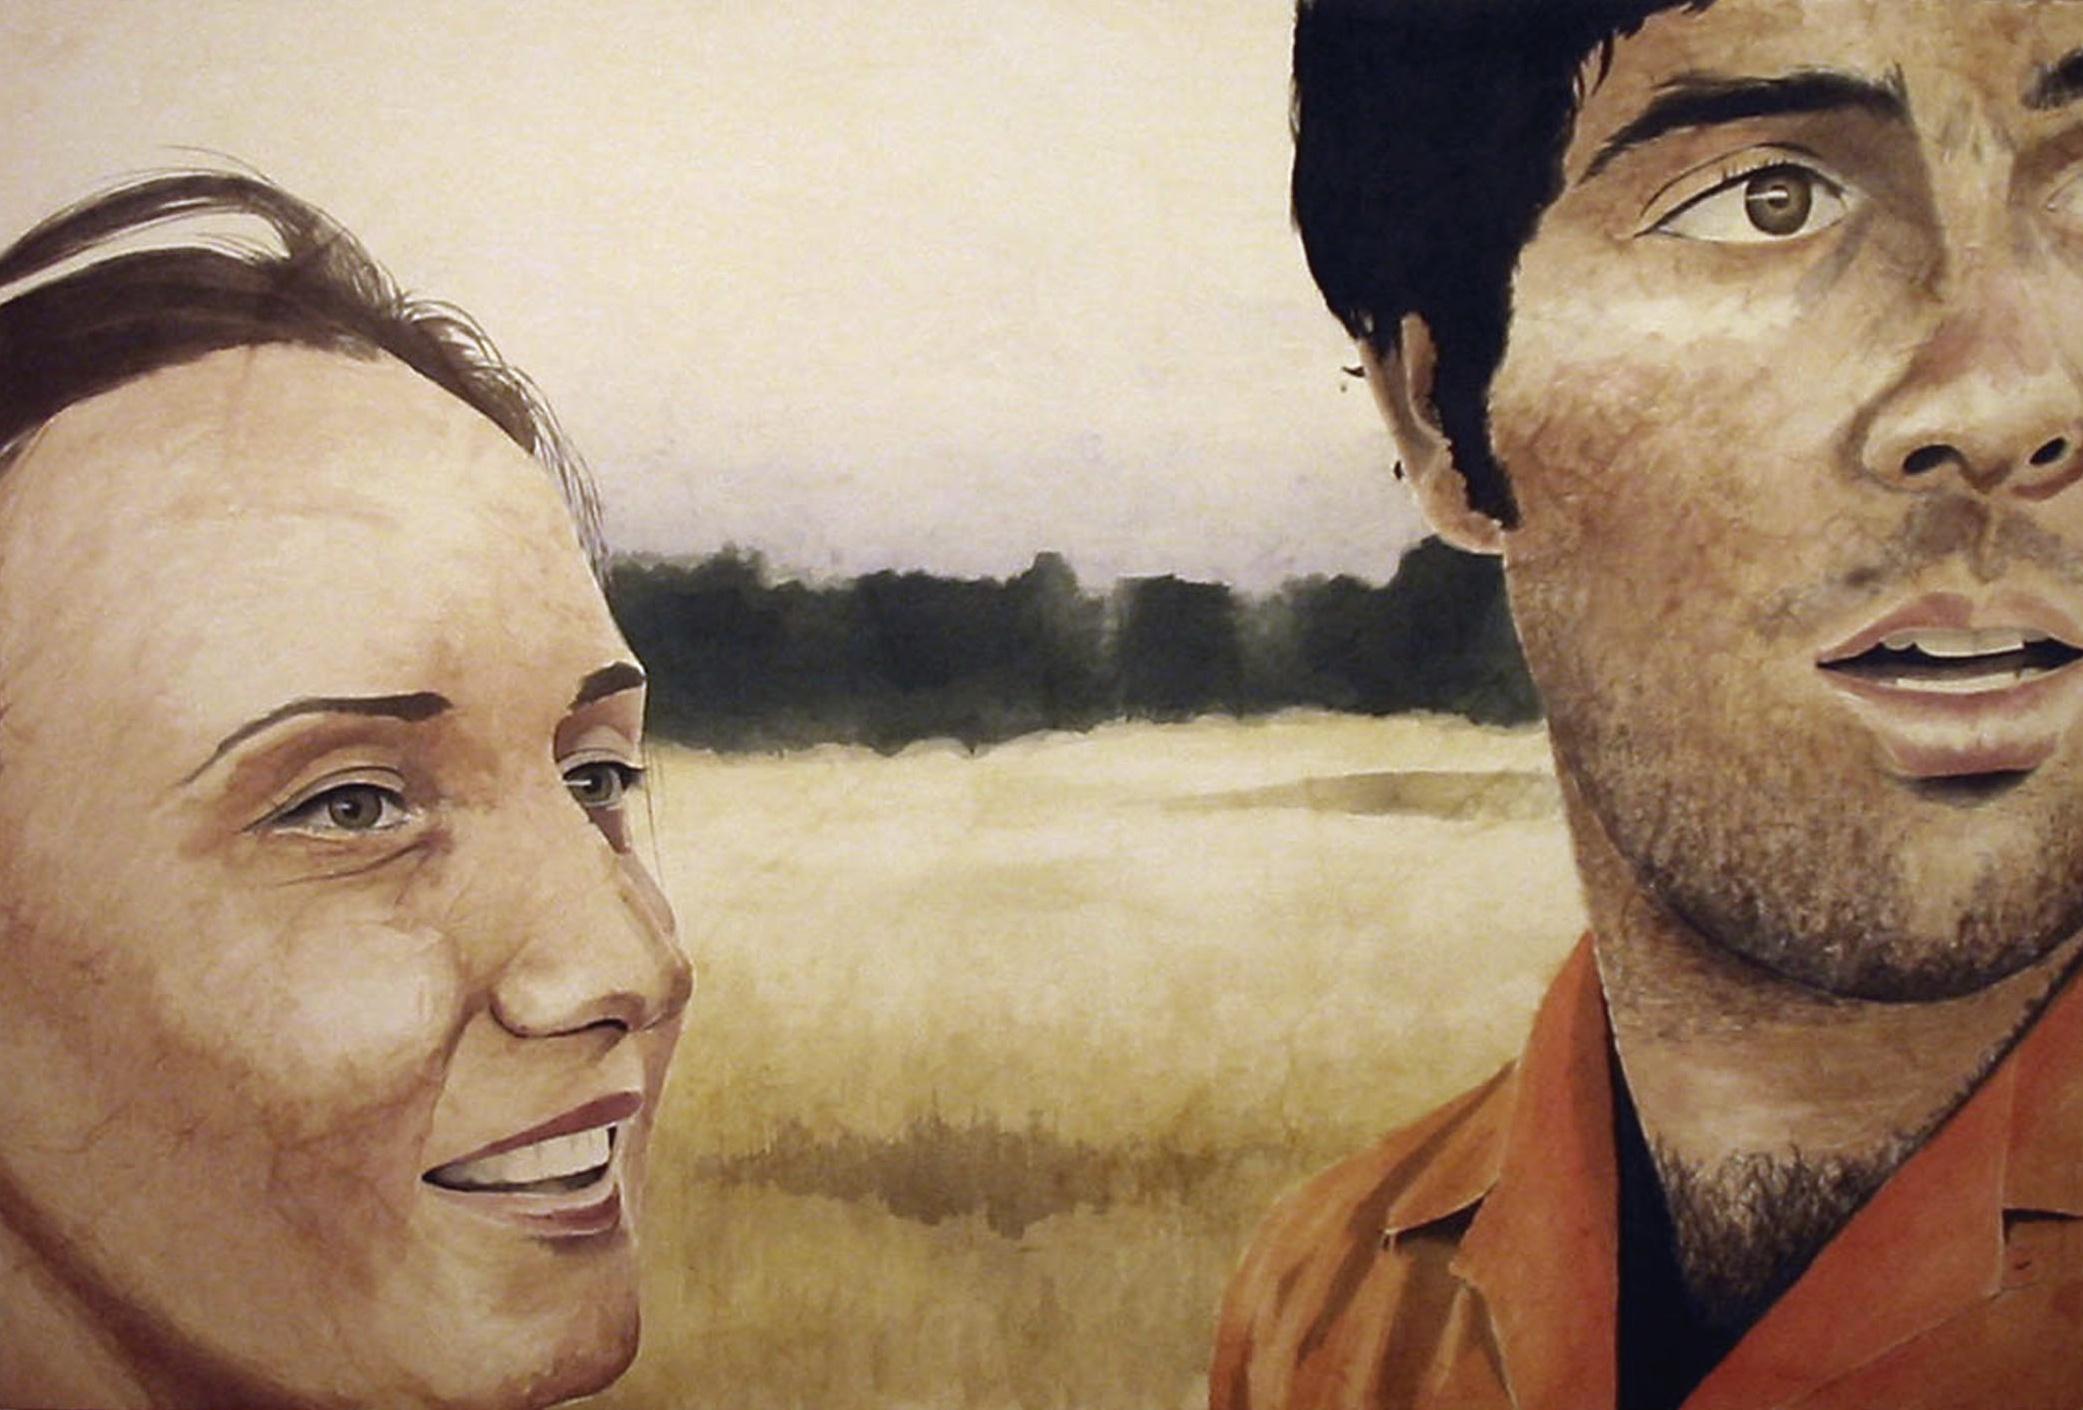 Arran and Ramona, 2010